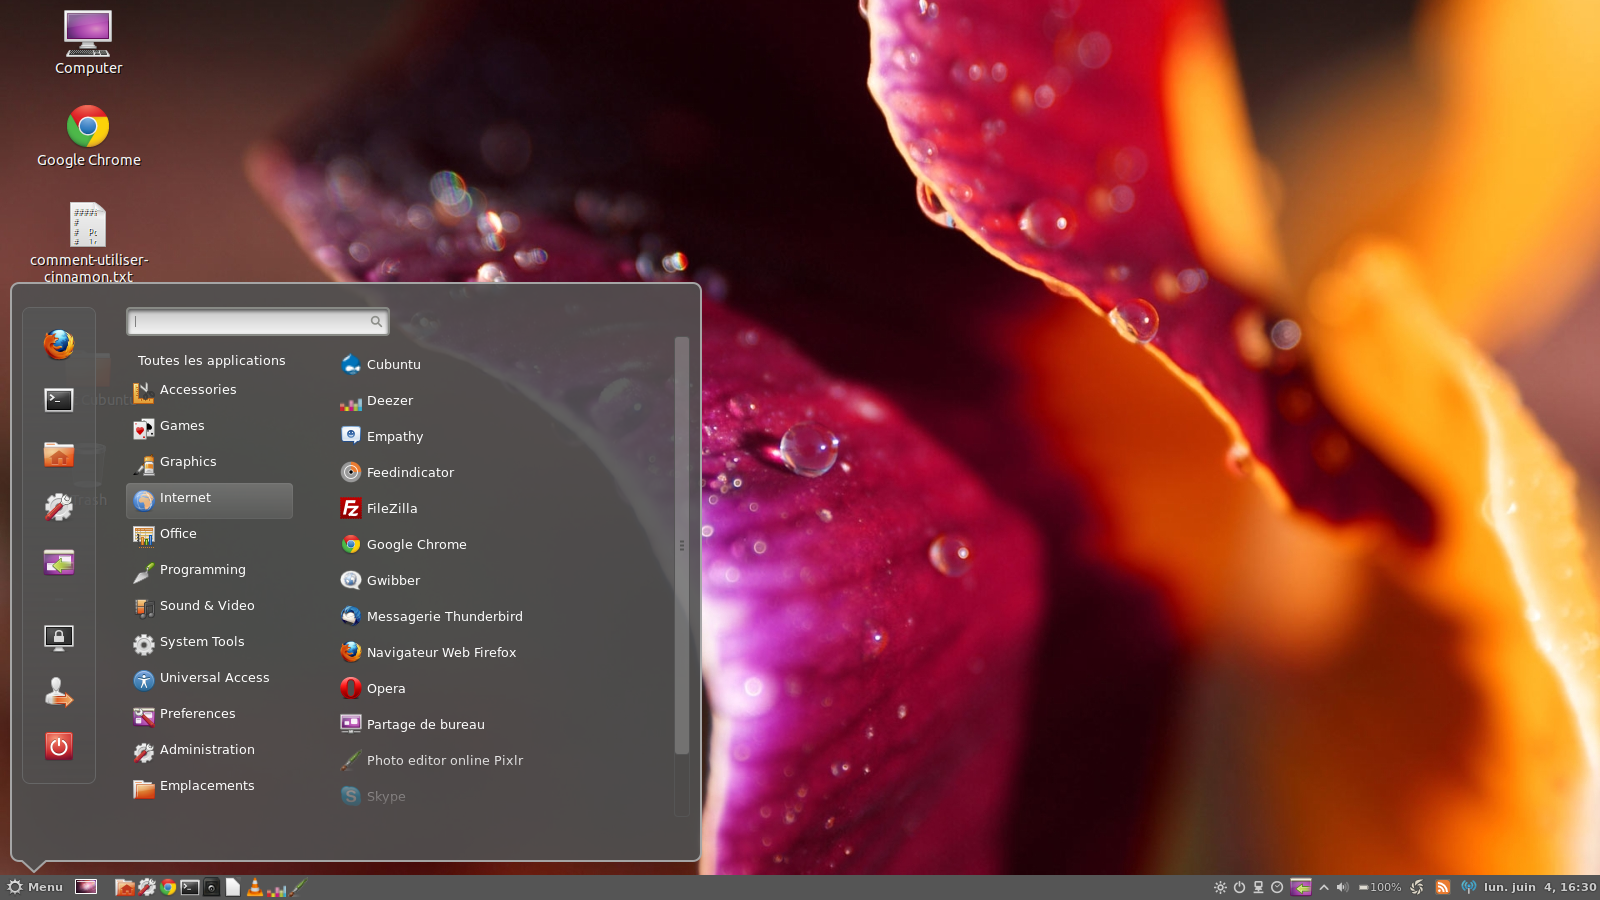 cubuntu: ubuntu + cinnamon + extra